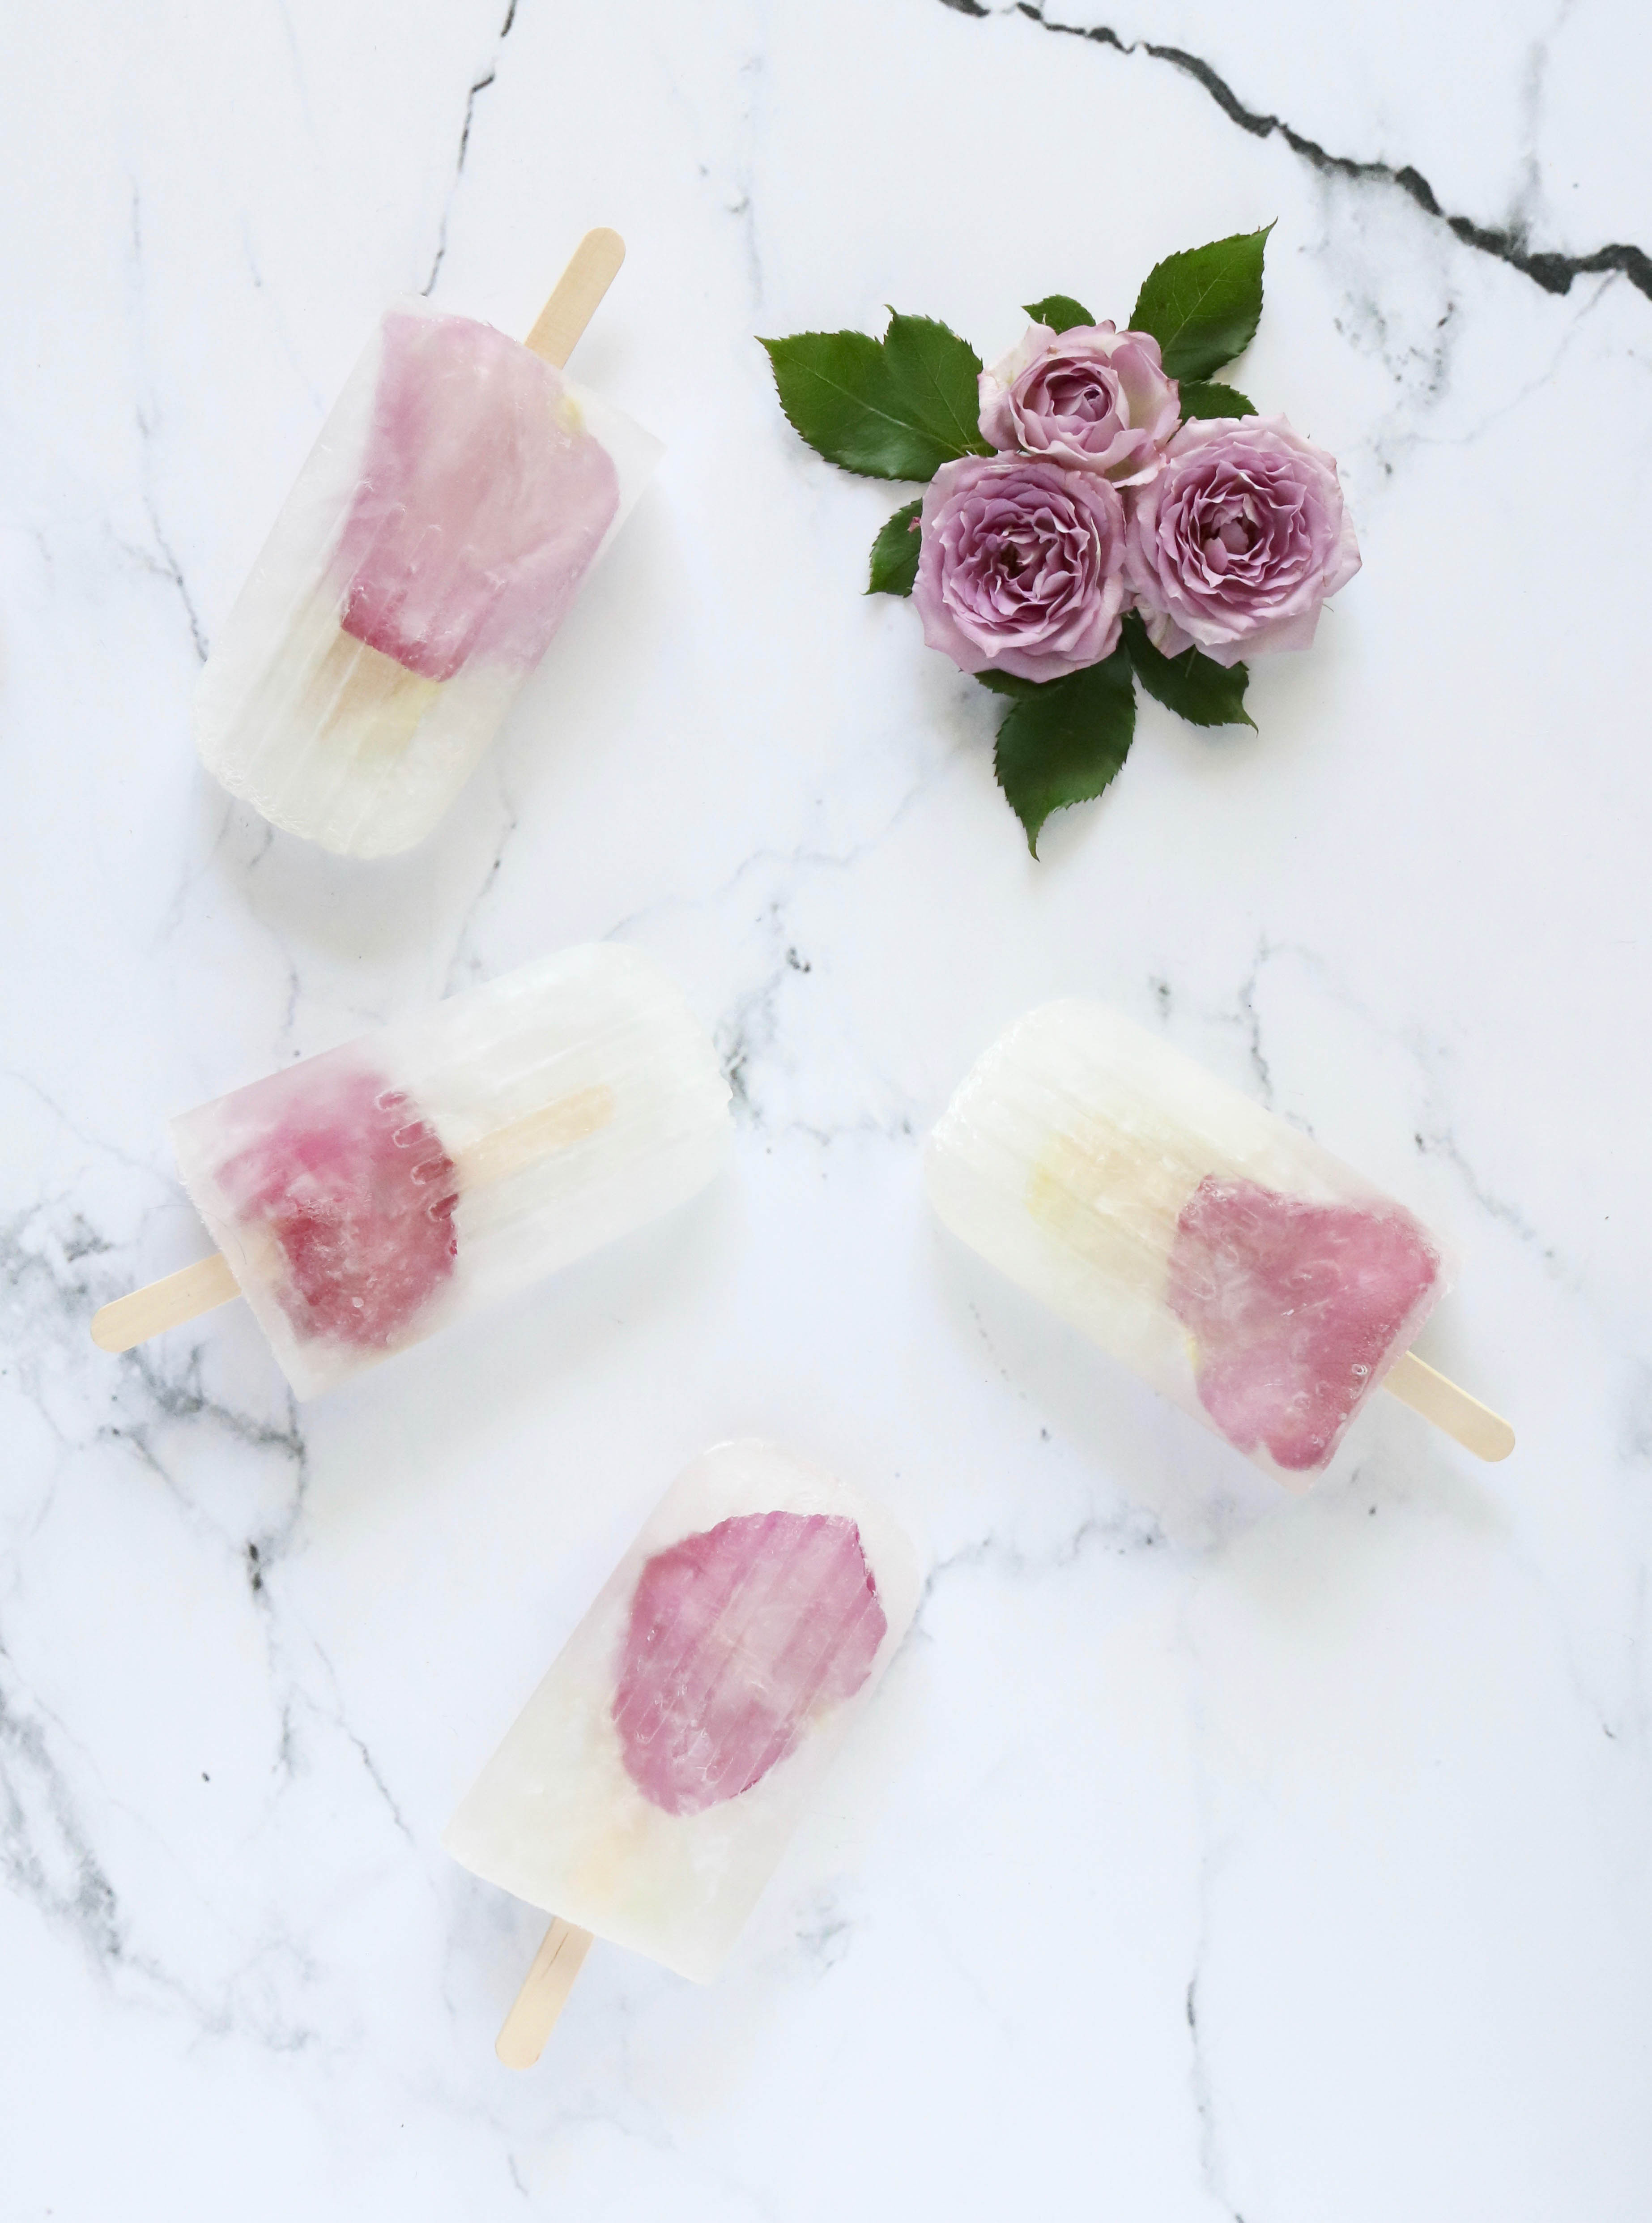 prosecco rose popsicles